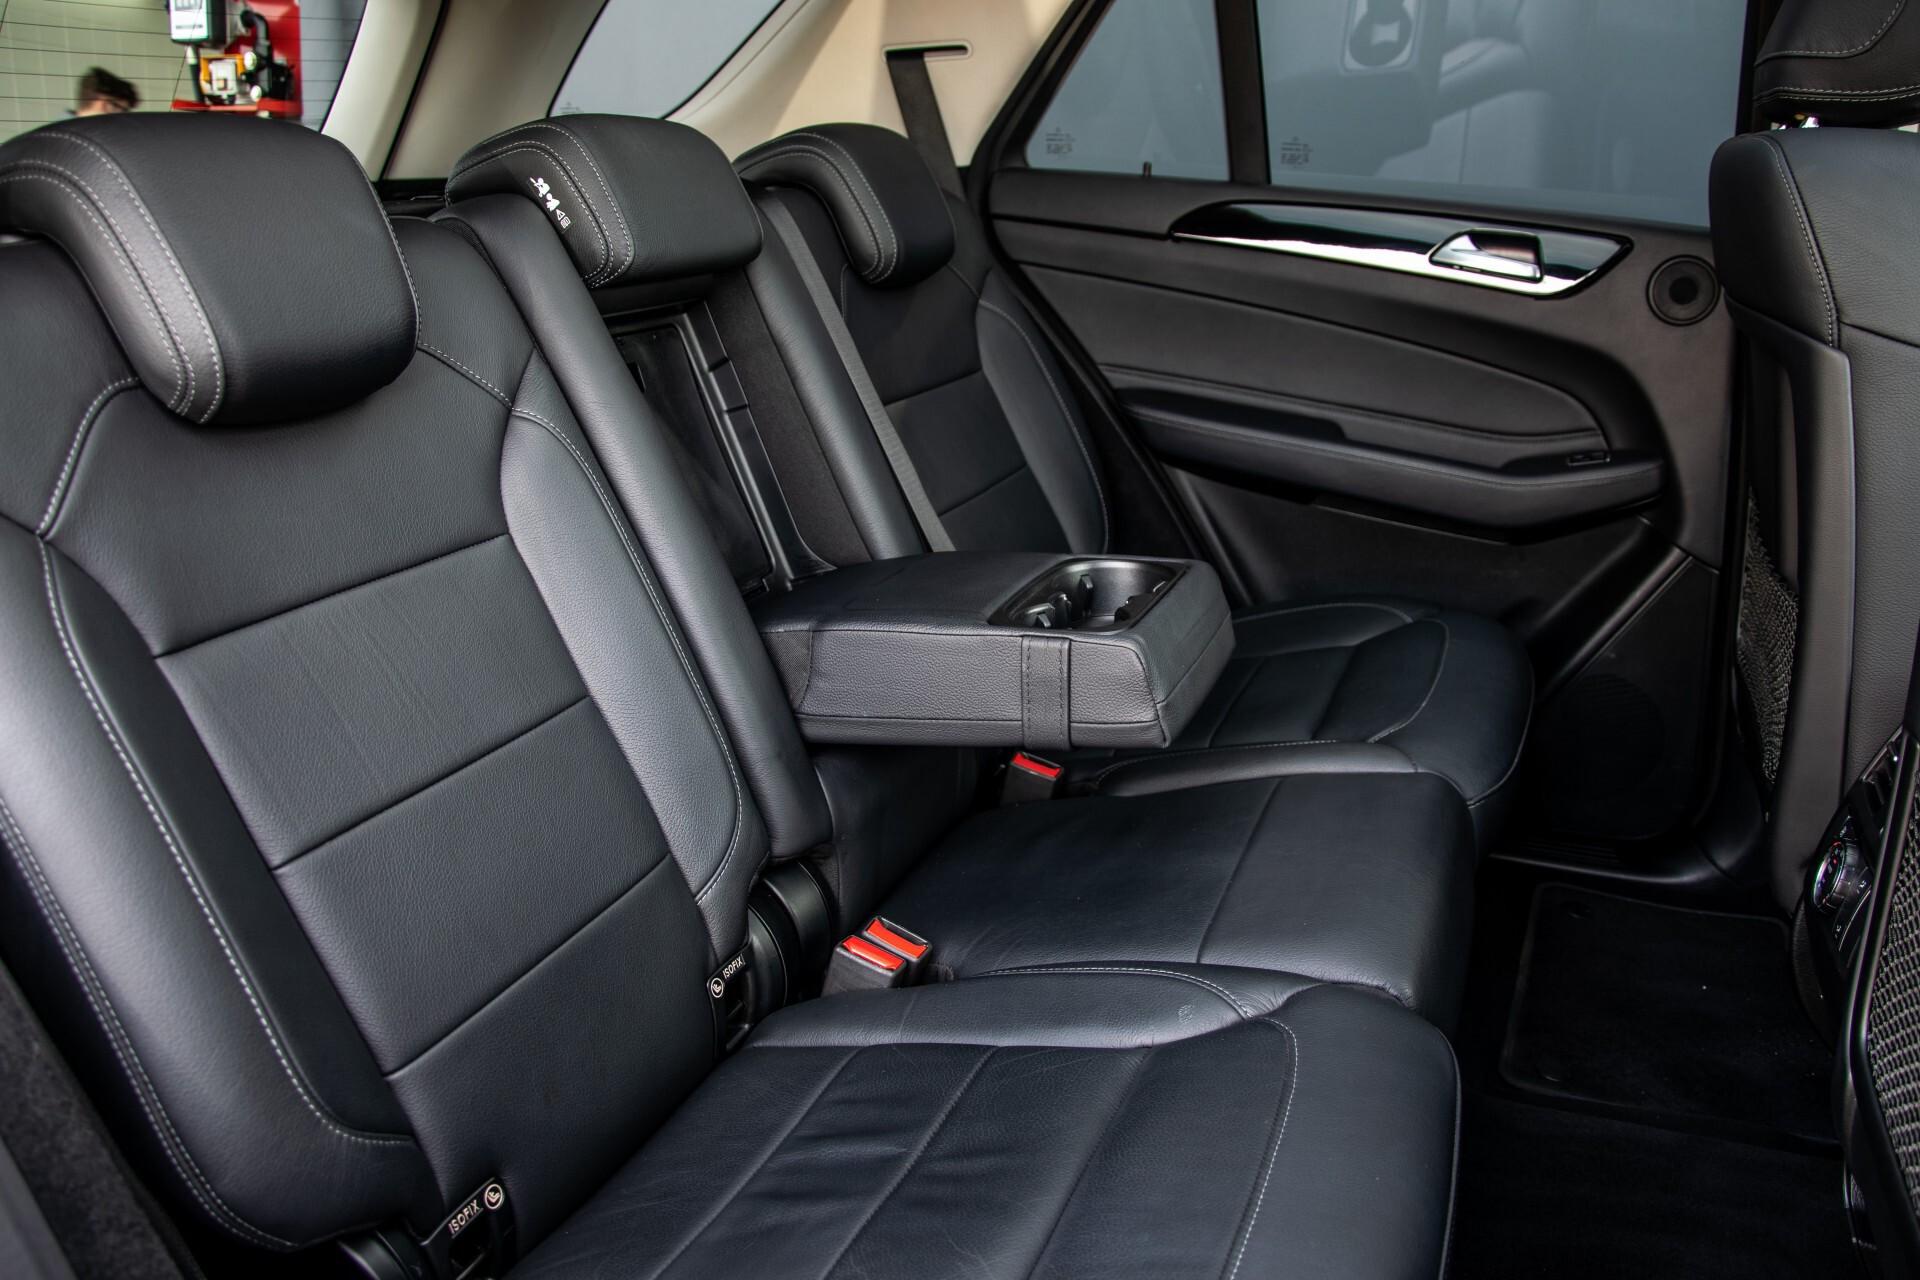 Mercedes-Benz GLE 350 d 4-M AMG Active Curve System/Panorama/Standkachel/Harman-Kardon/Trekhaak Aut9 Foto 5